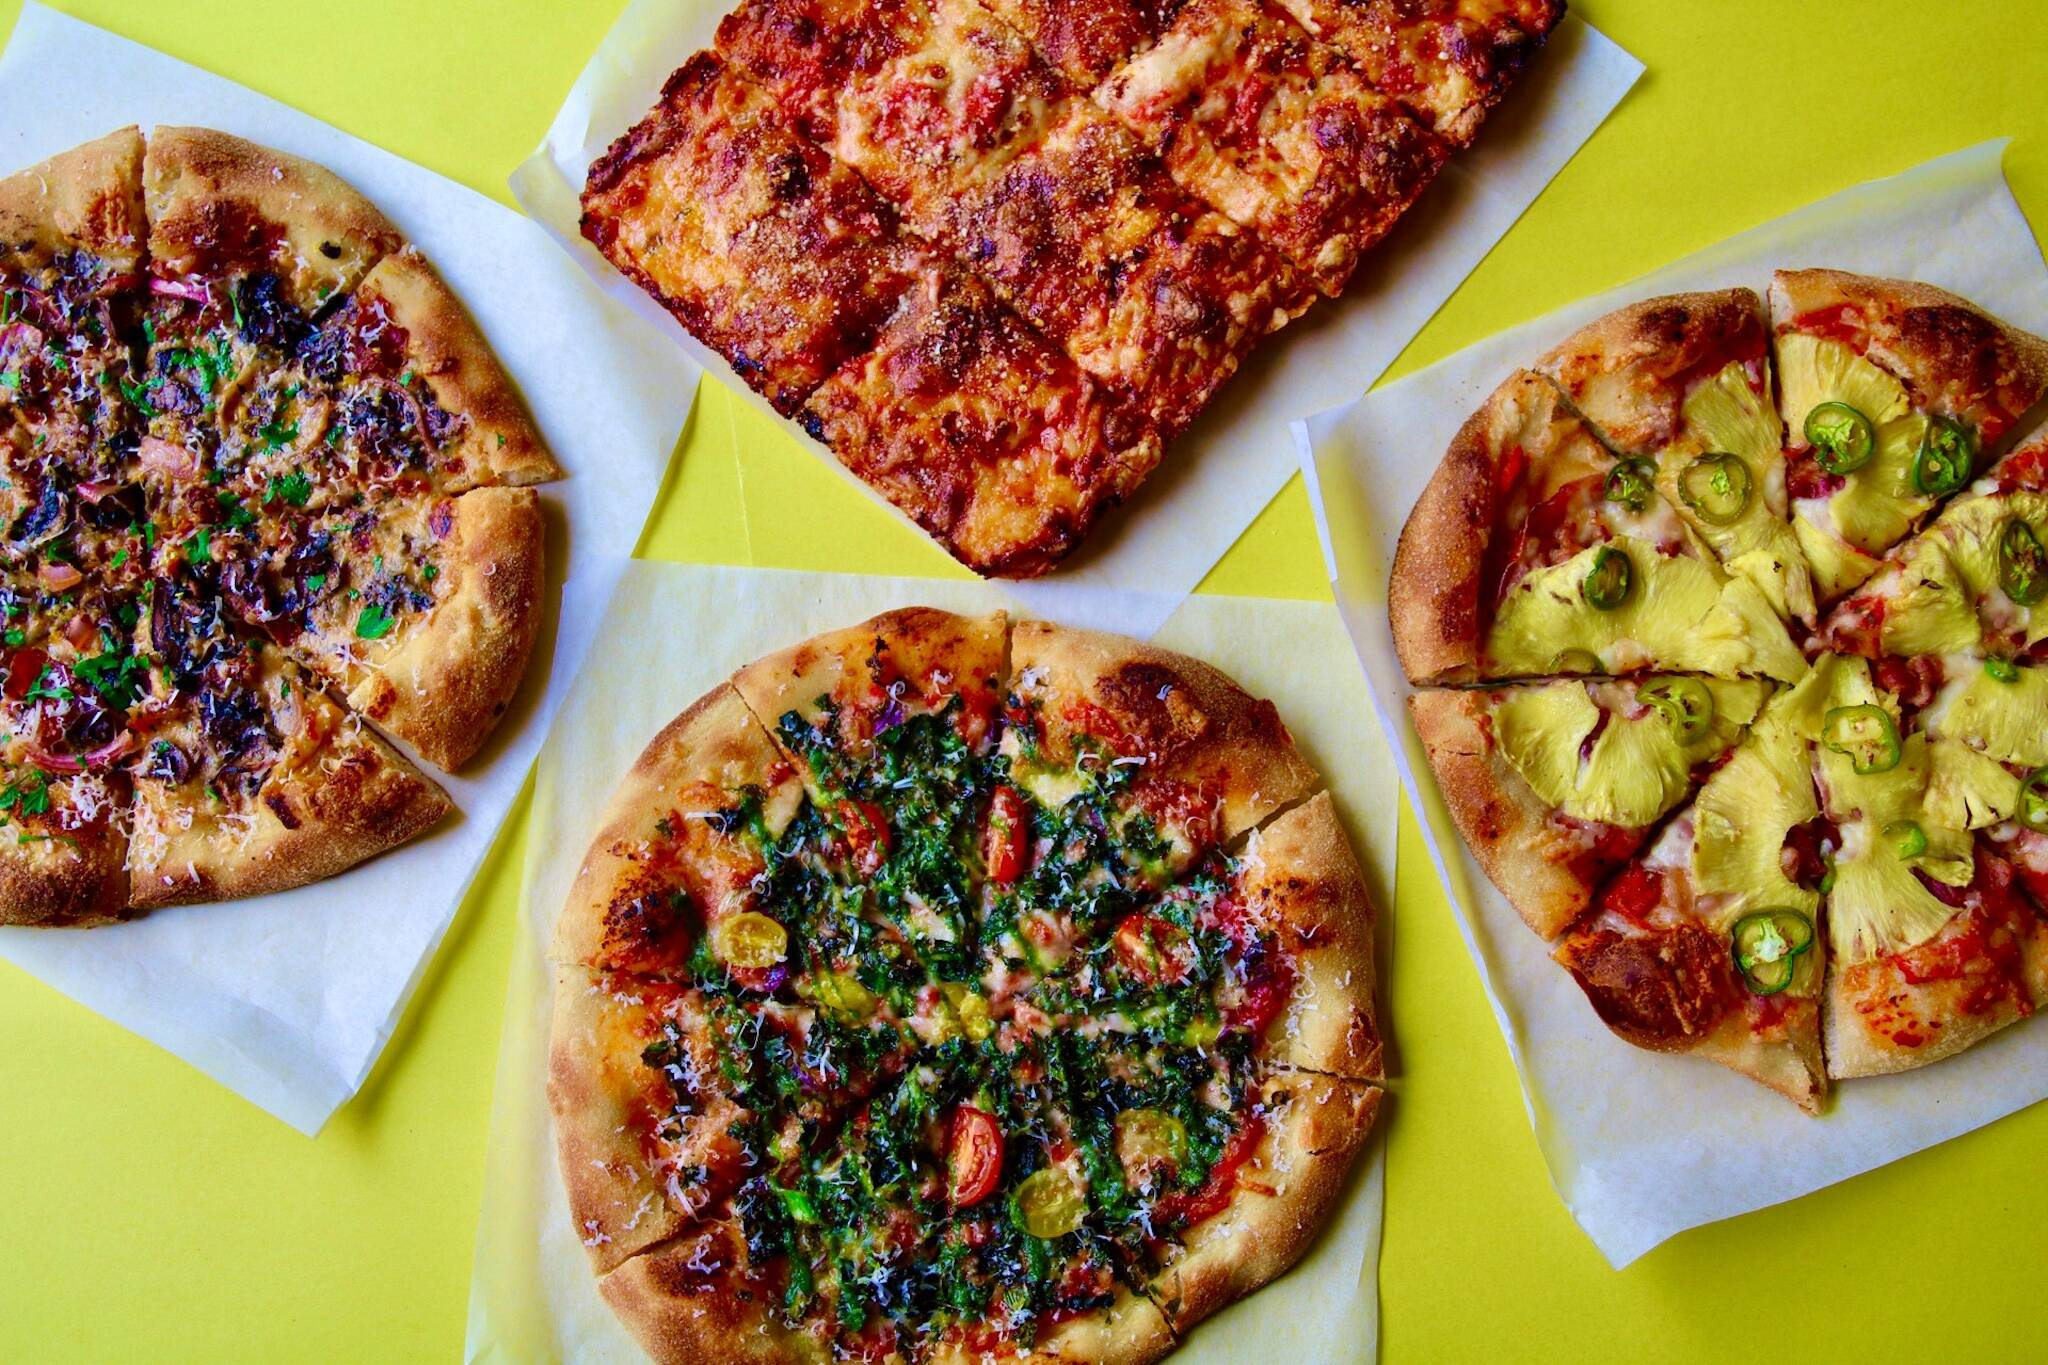 pie eyed pizza toronto